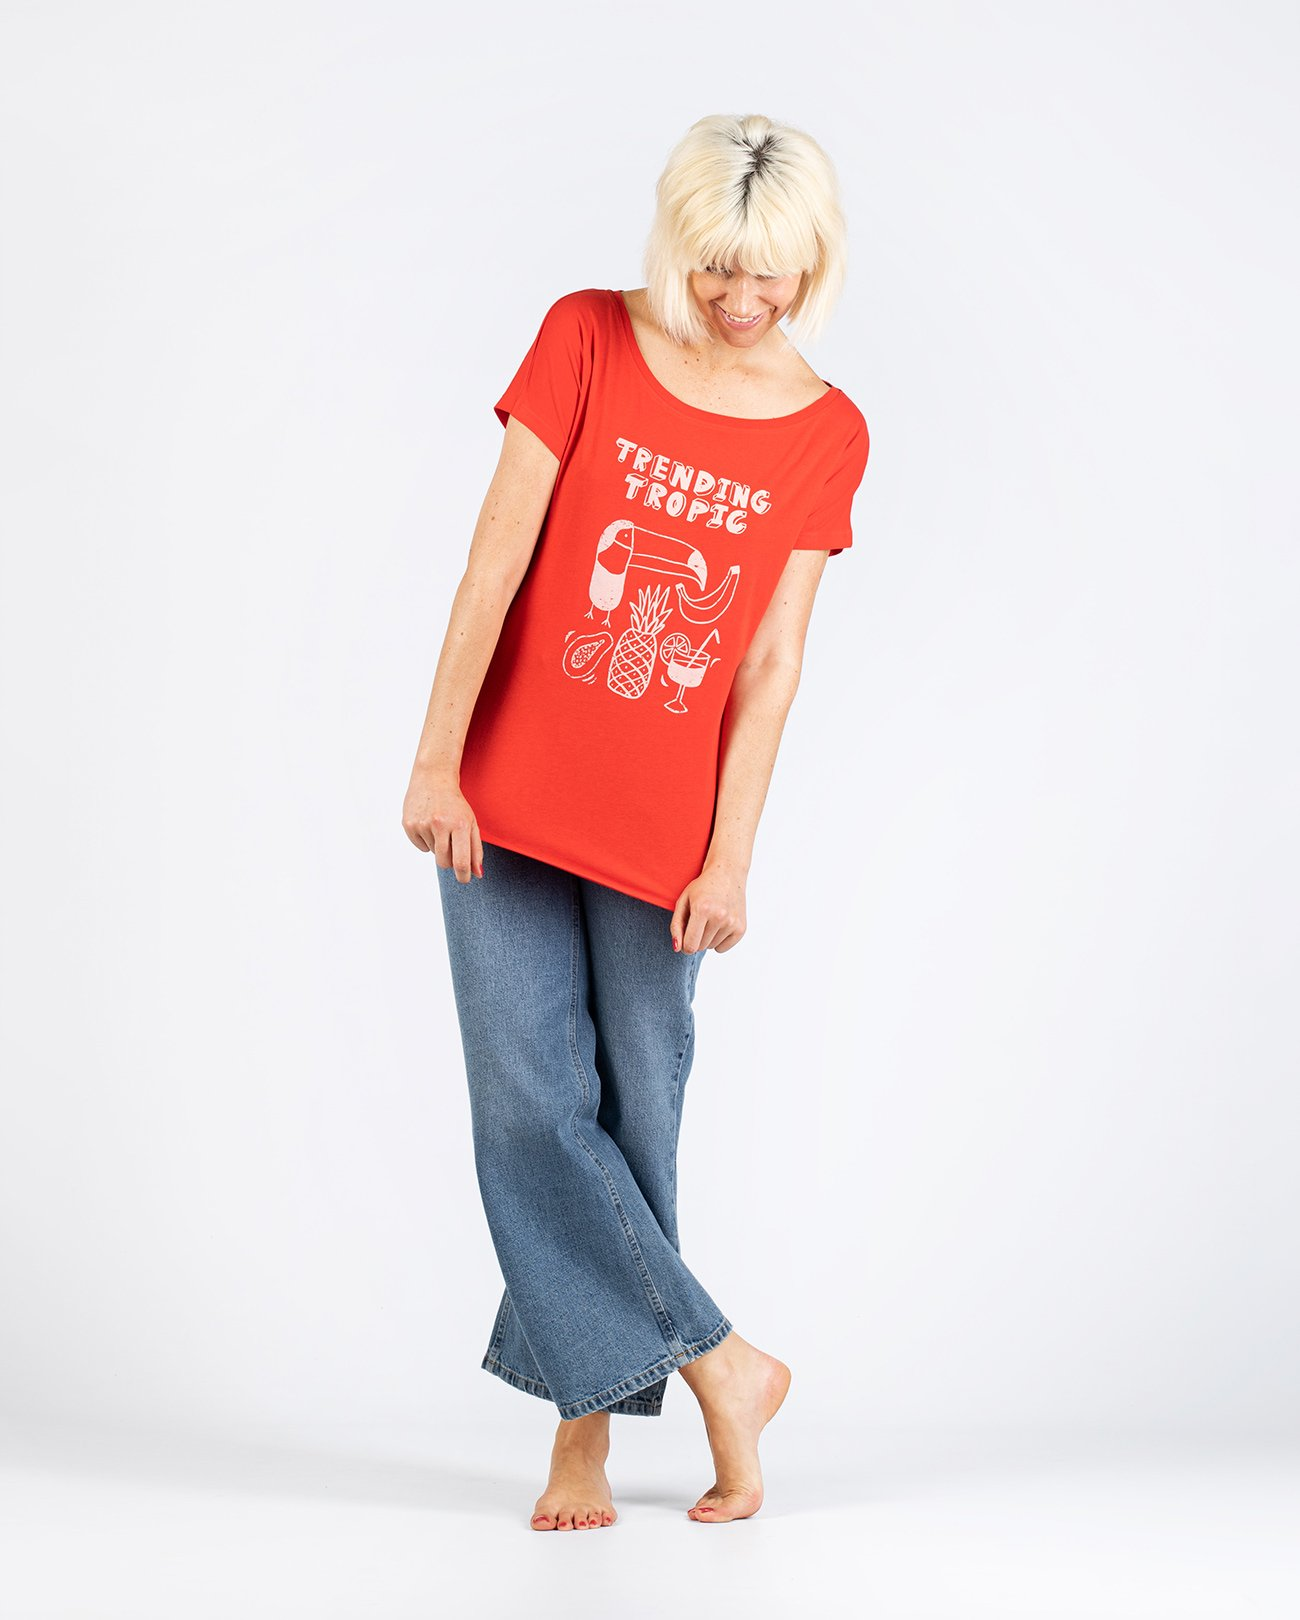 Camiseta Trending Tropic